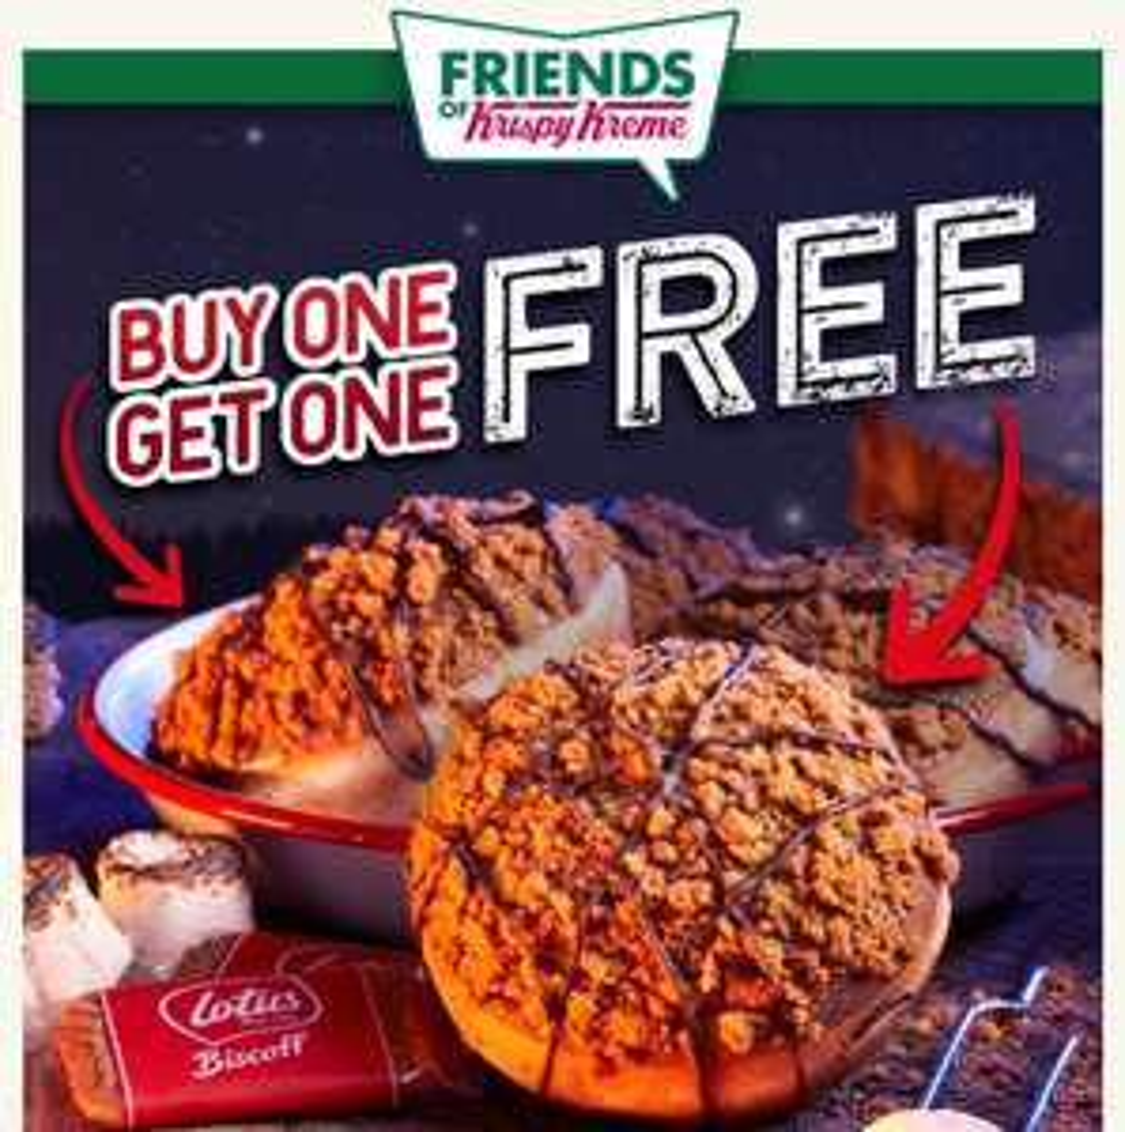 BOGOF On Lotus Biscoff doughnut this Wednesday @ Krispy Kreme's